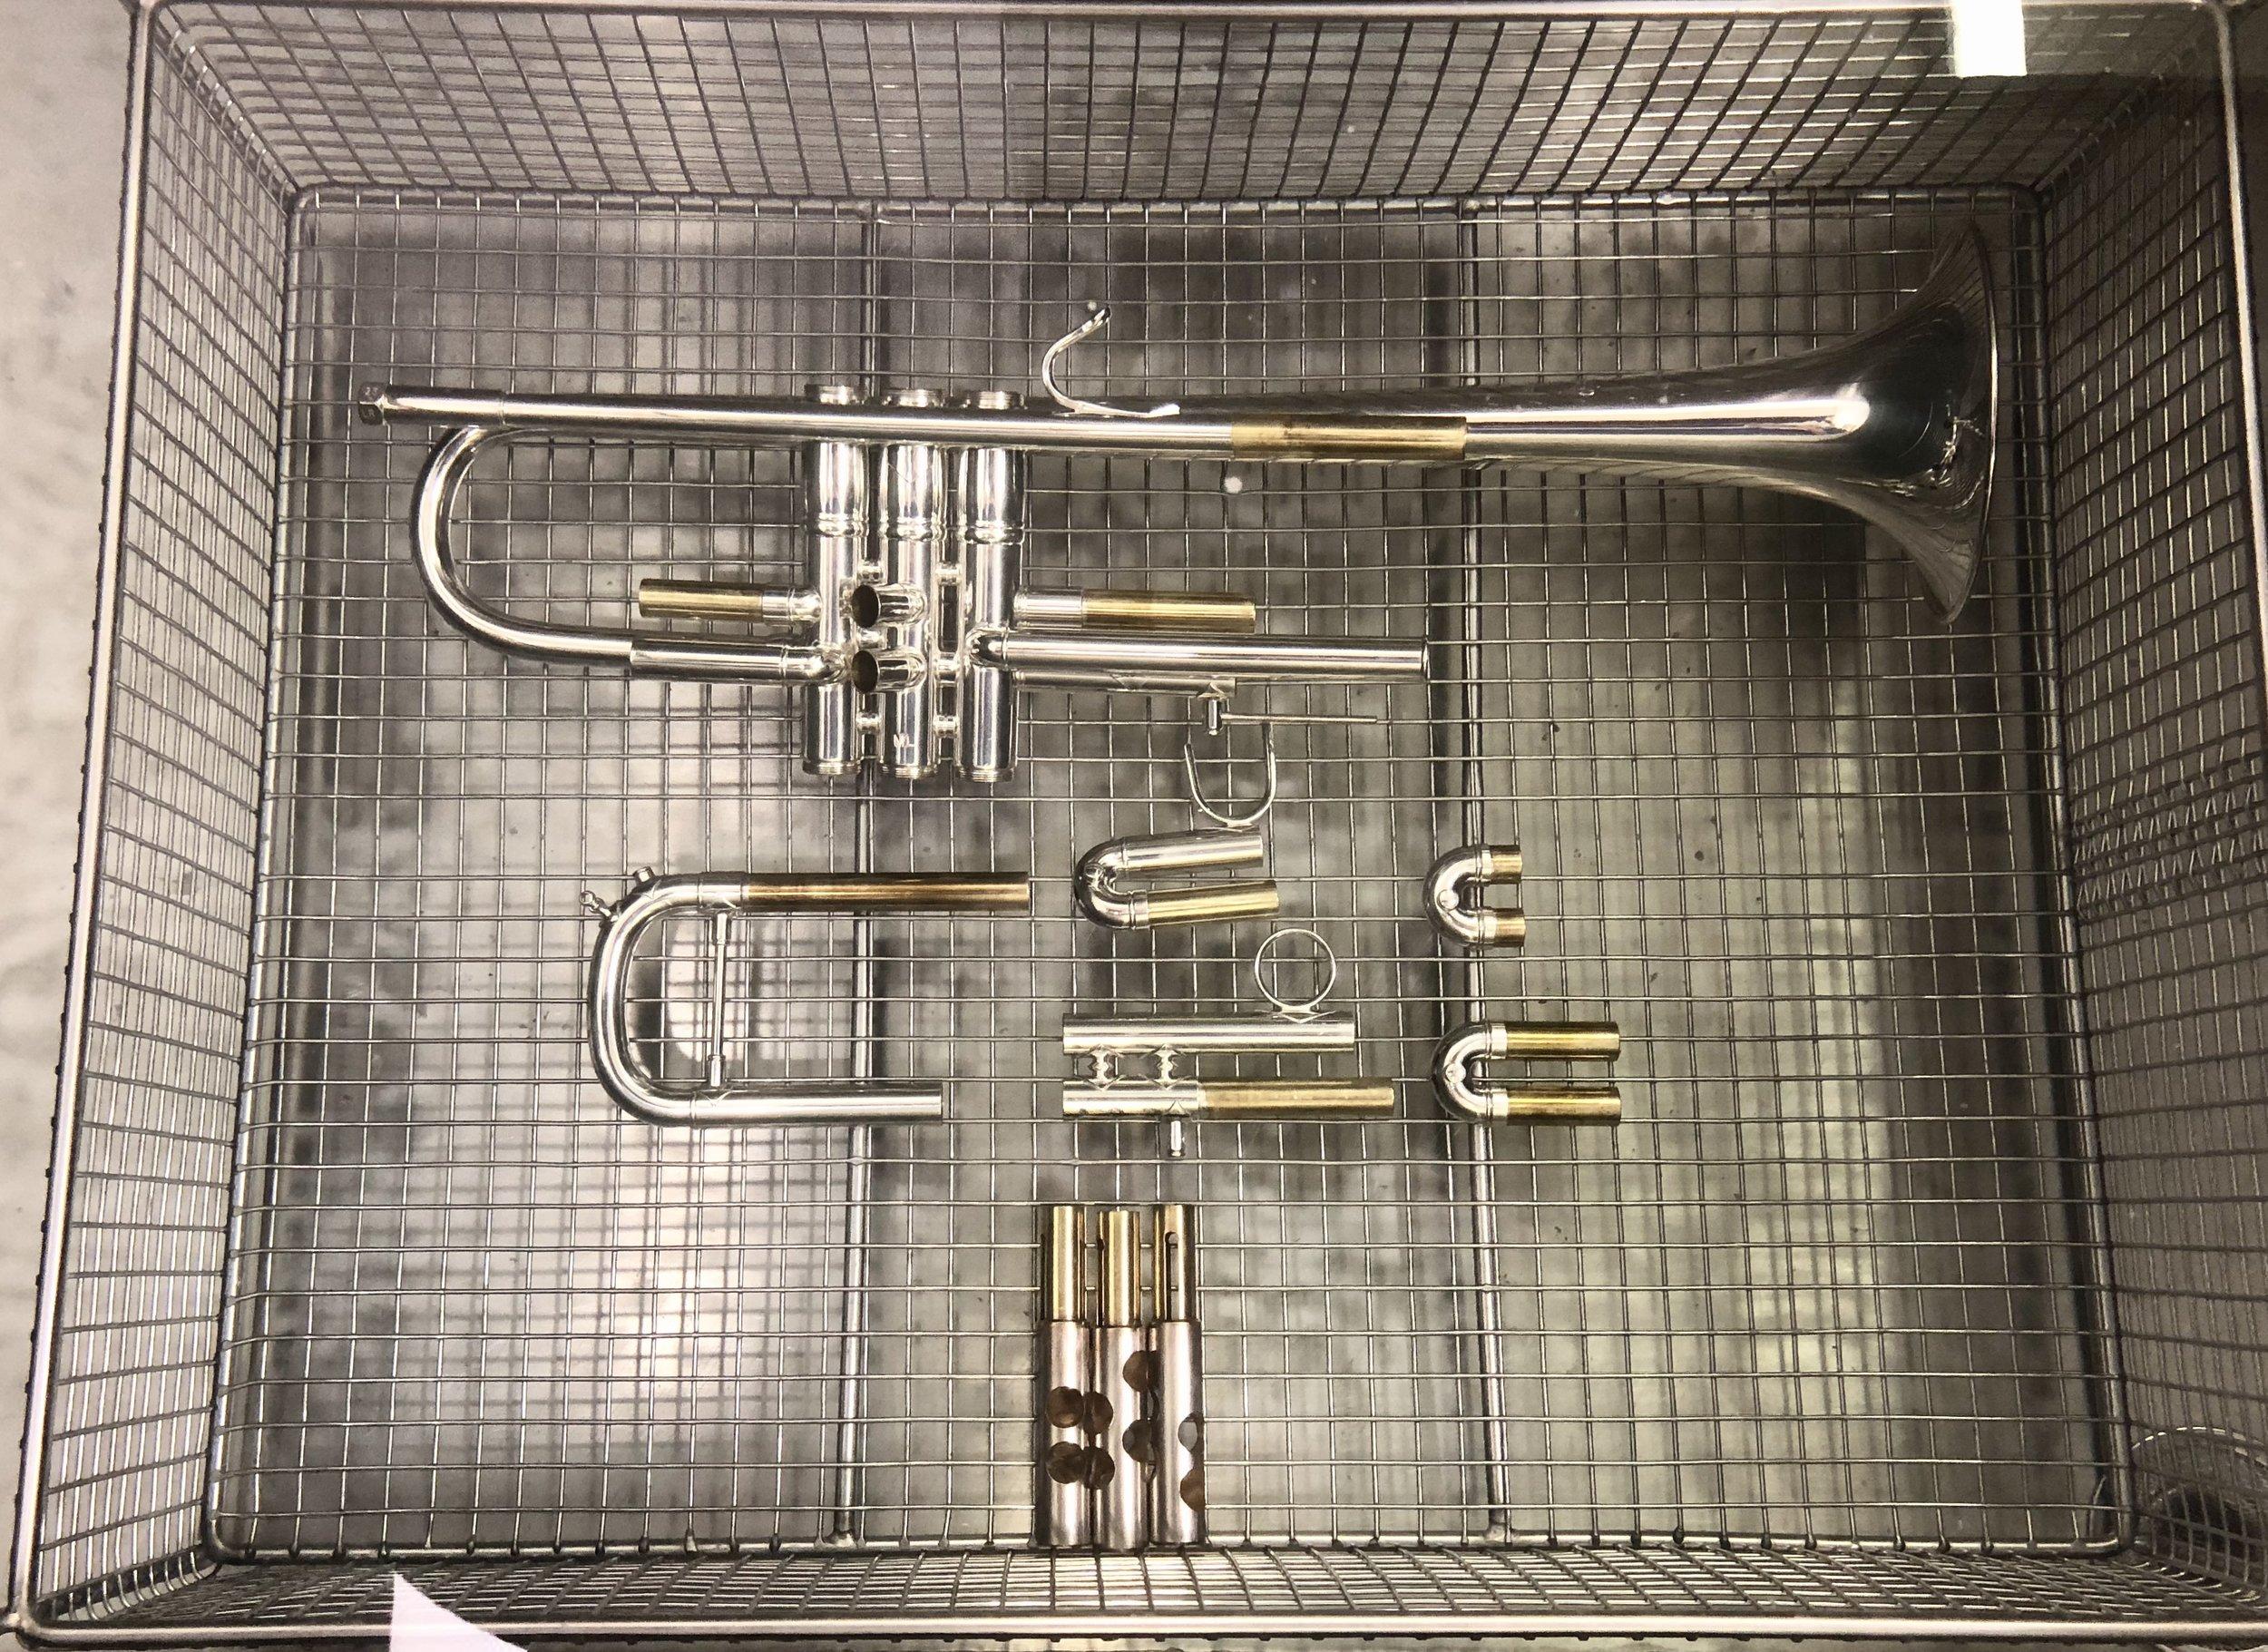 Sonic Cleaner Trumpet